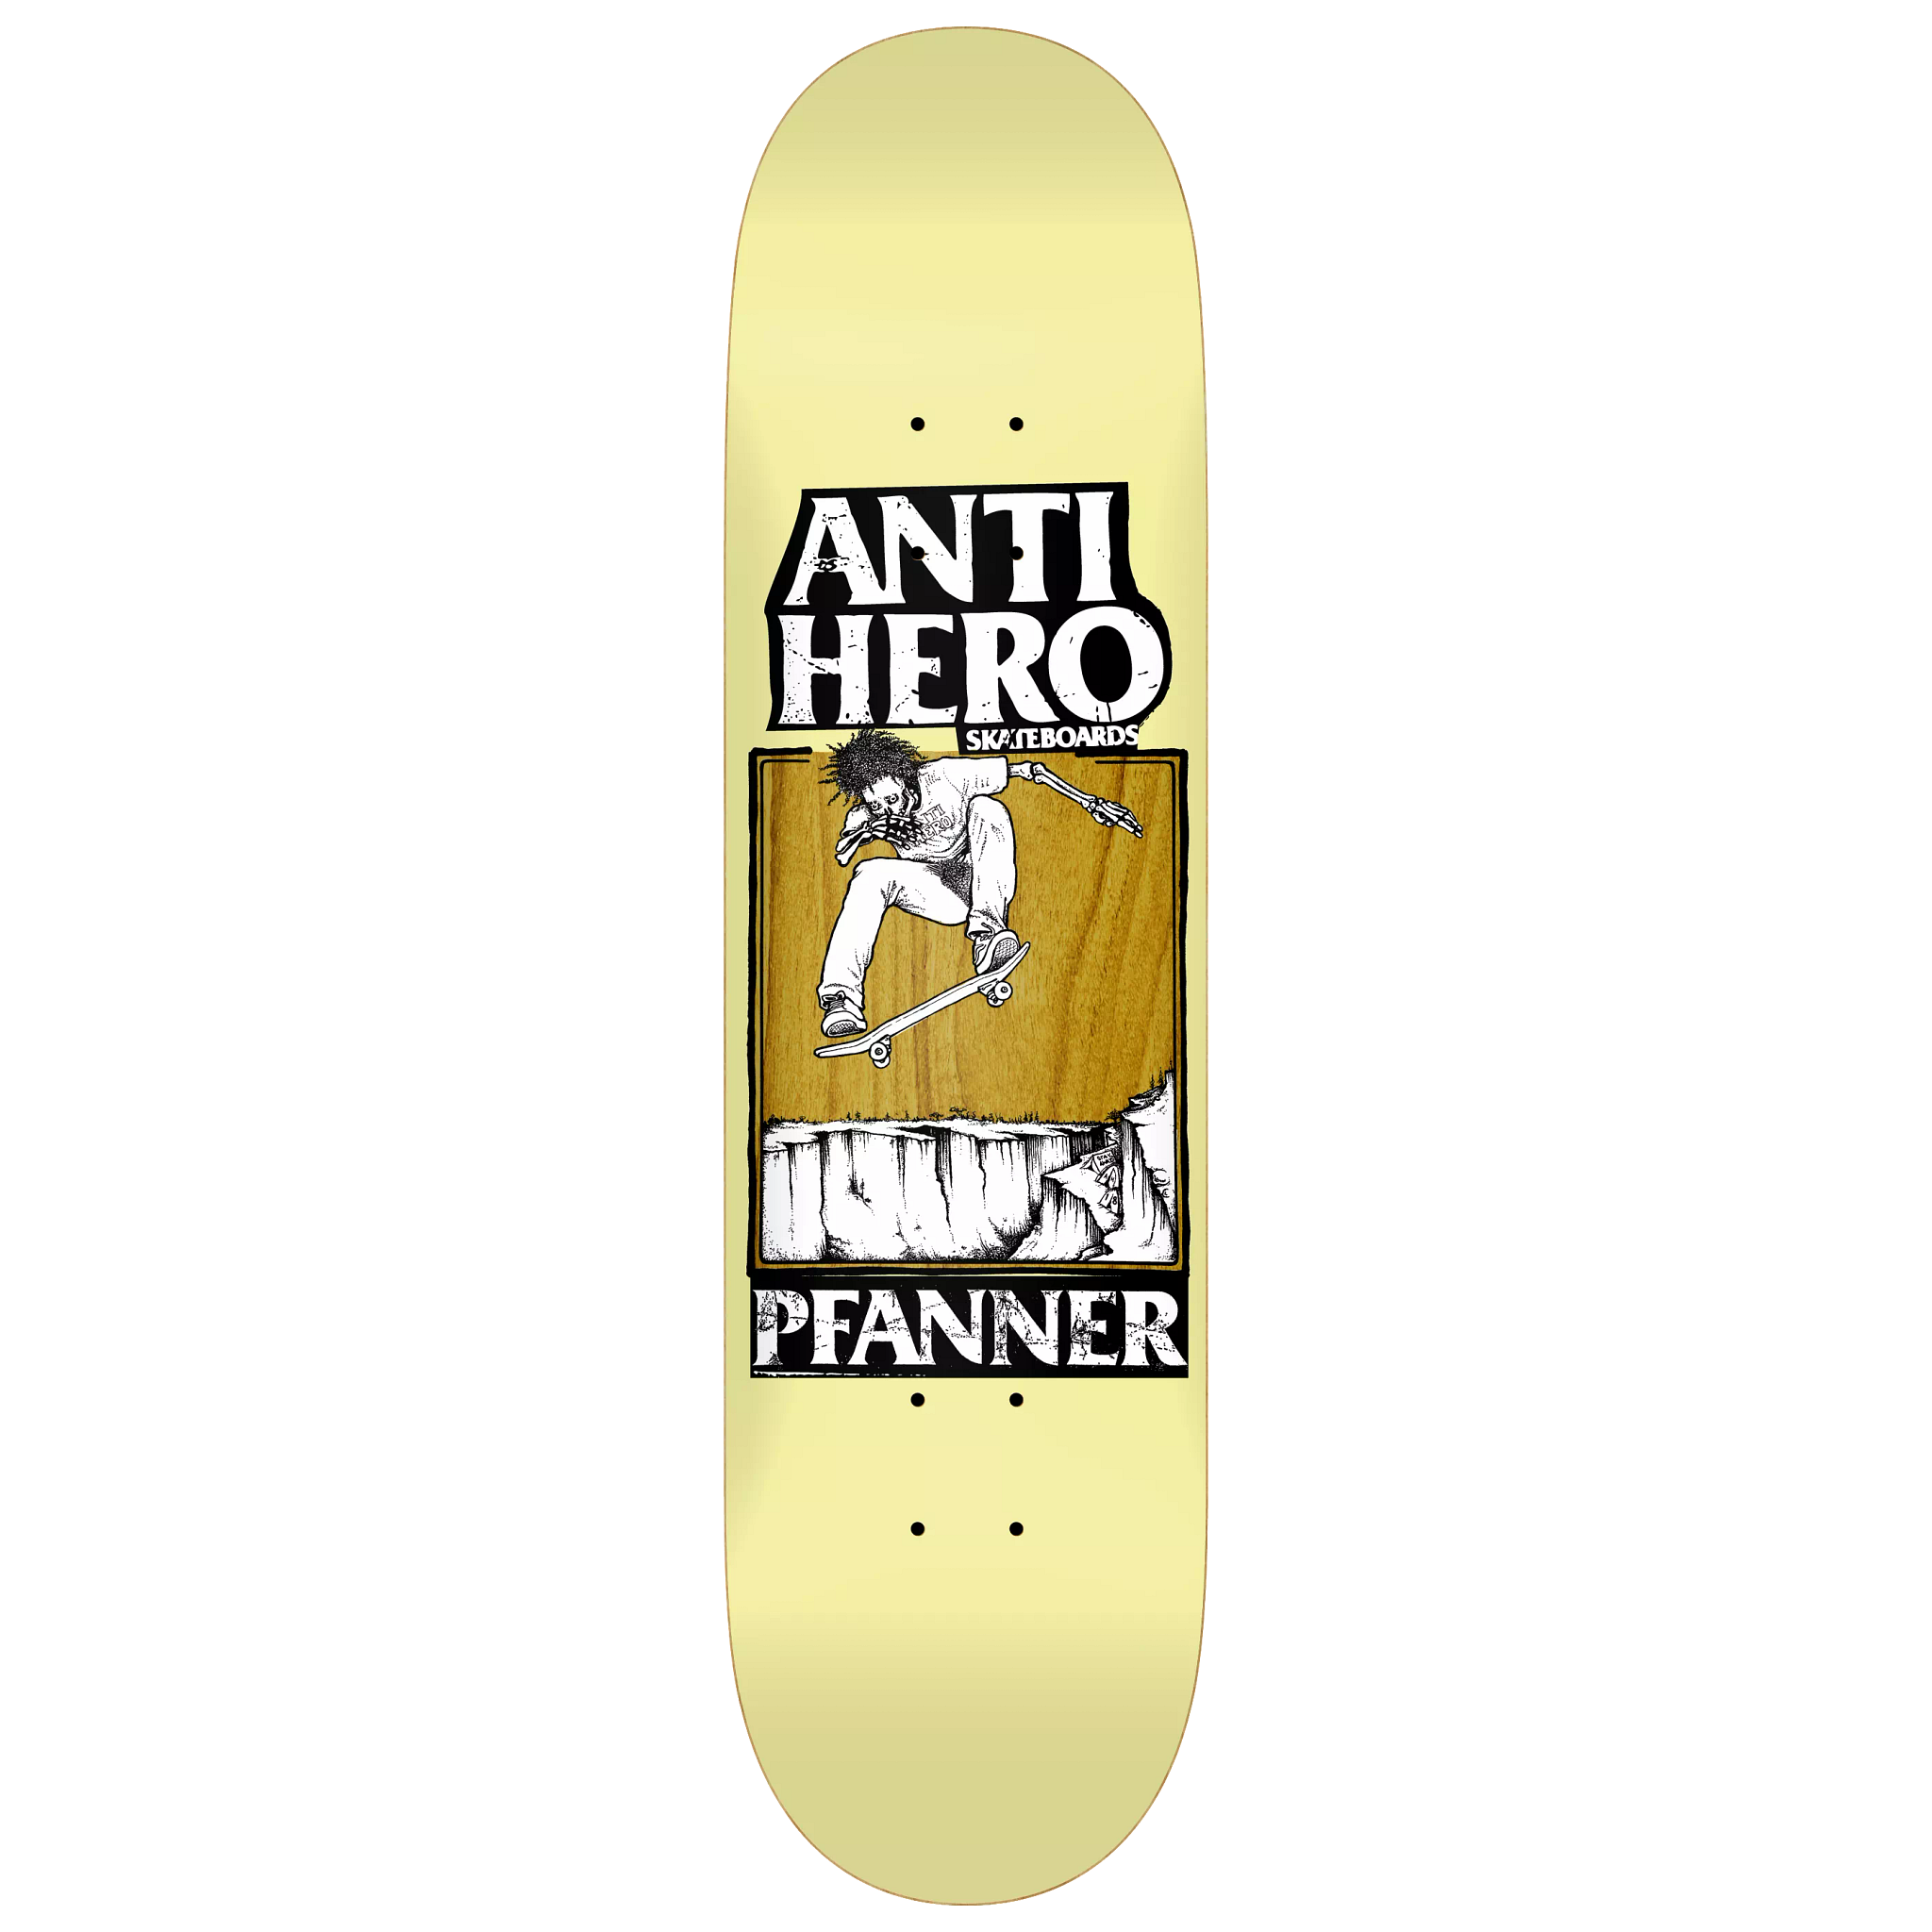 Anti Hero Pfanner x Lance 2 8.25